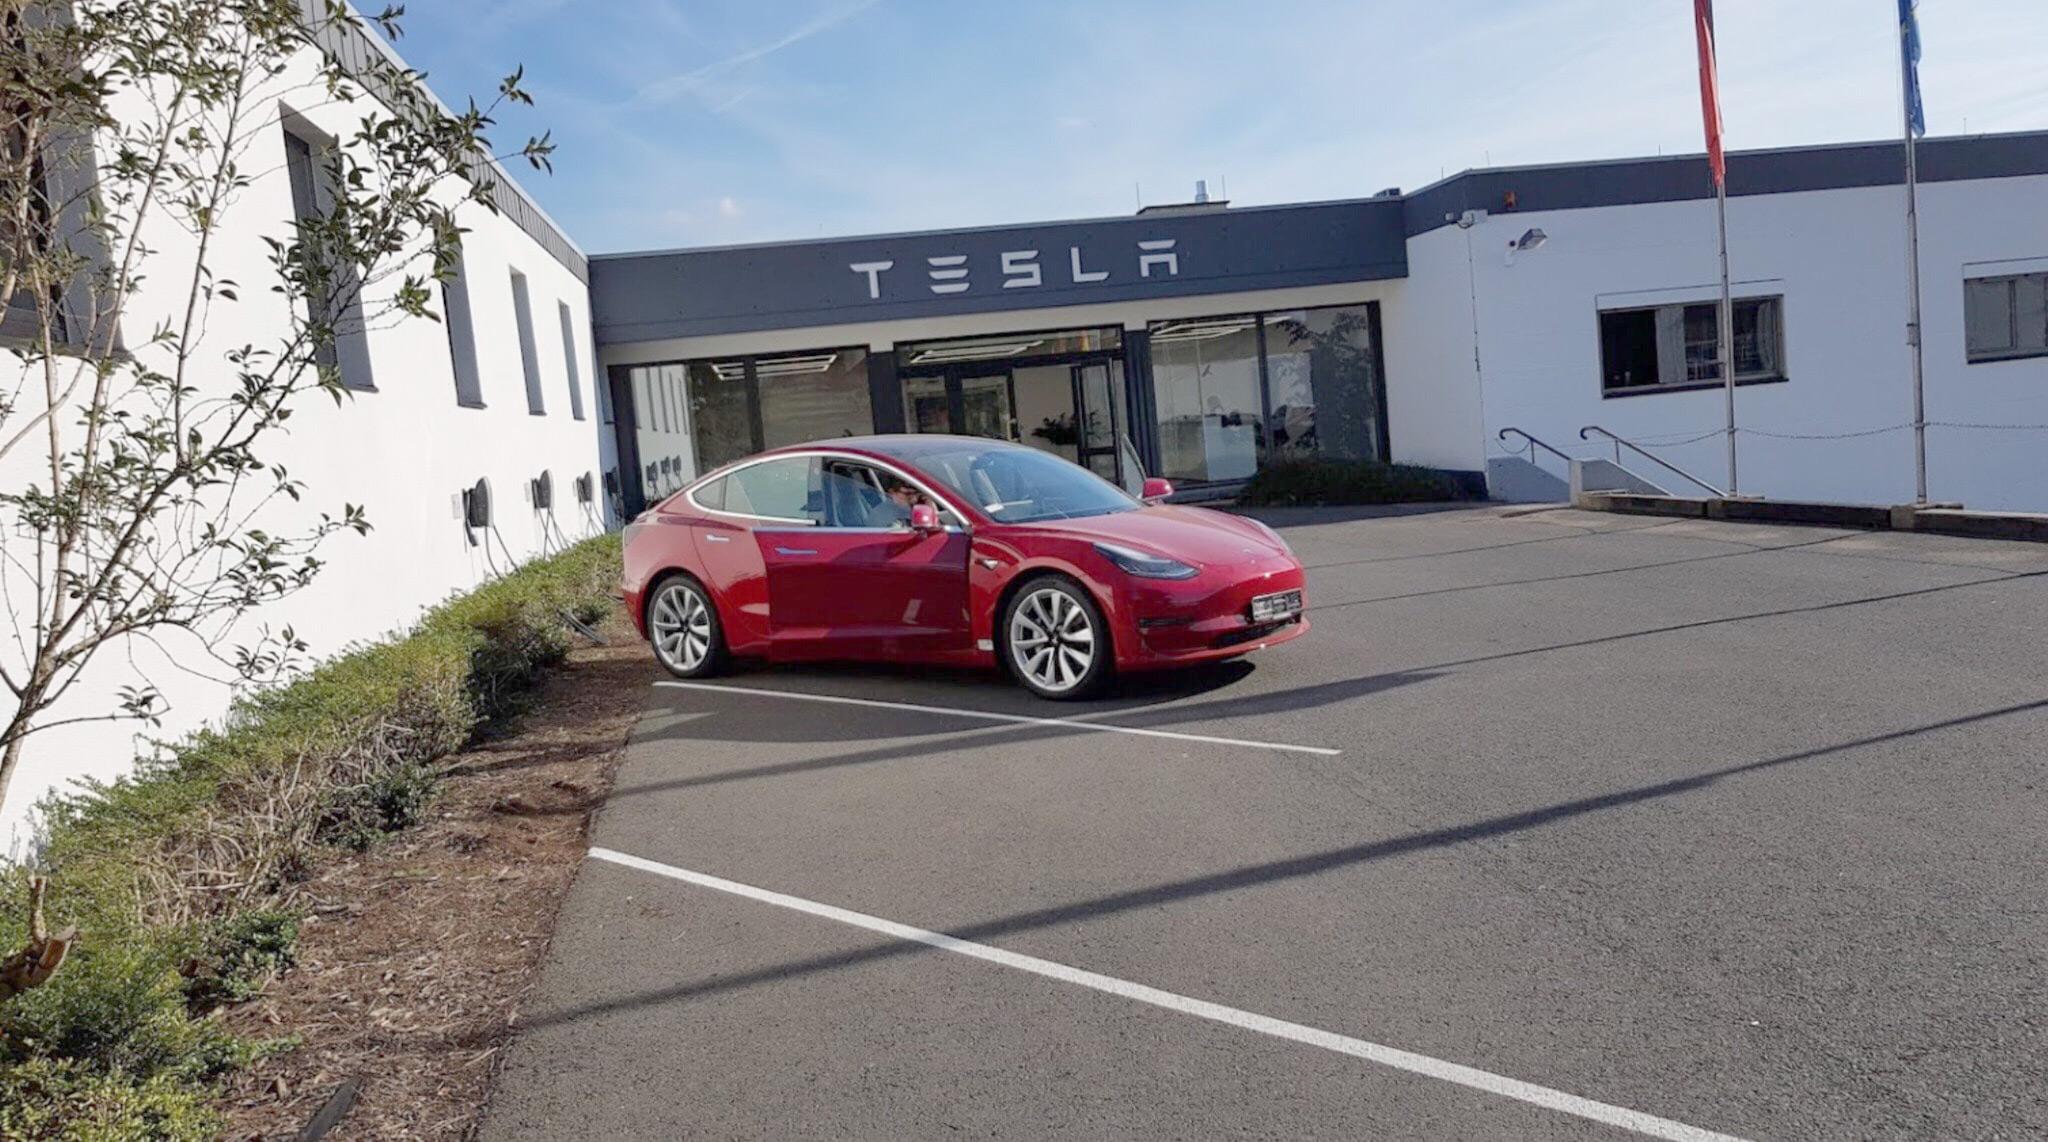 Tesla Model 3 Europe - Spotted at Tesla Grohmann, Germany